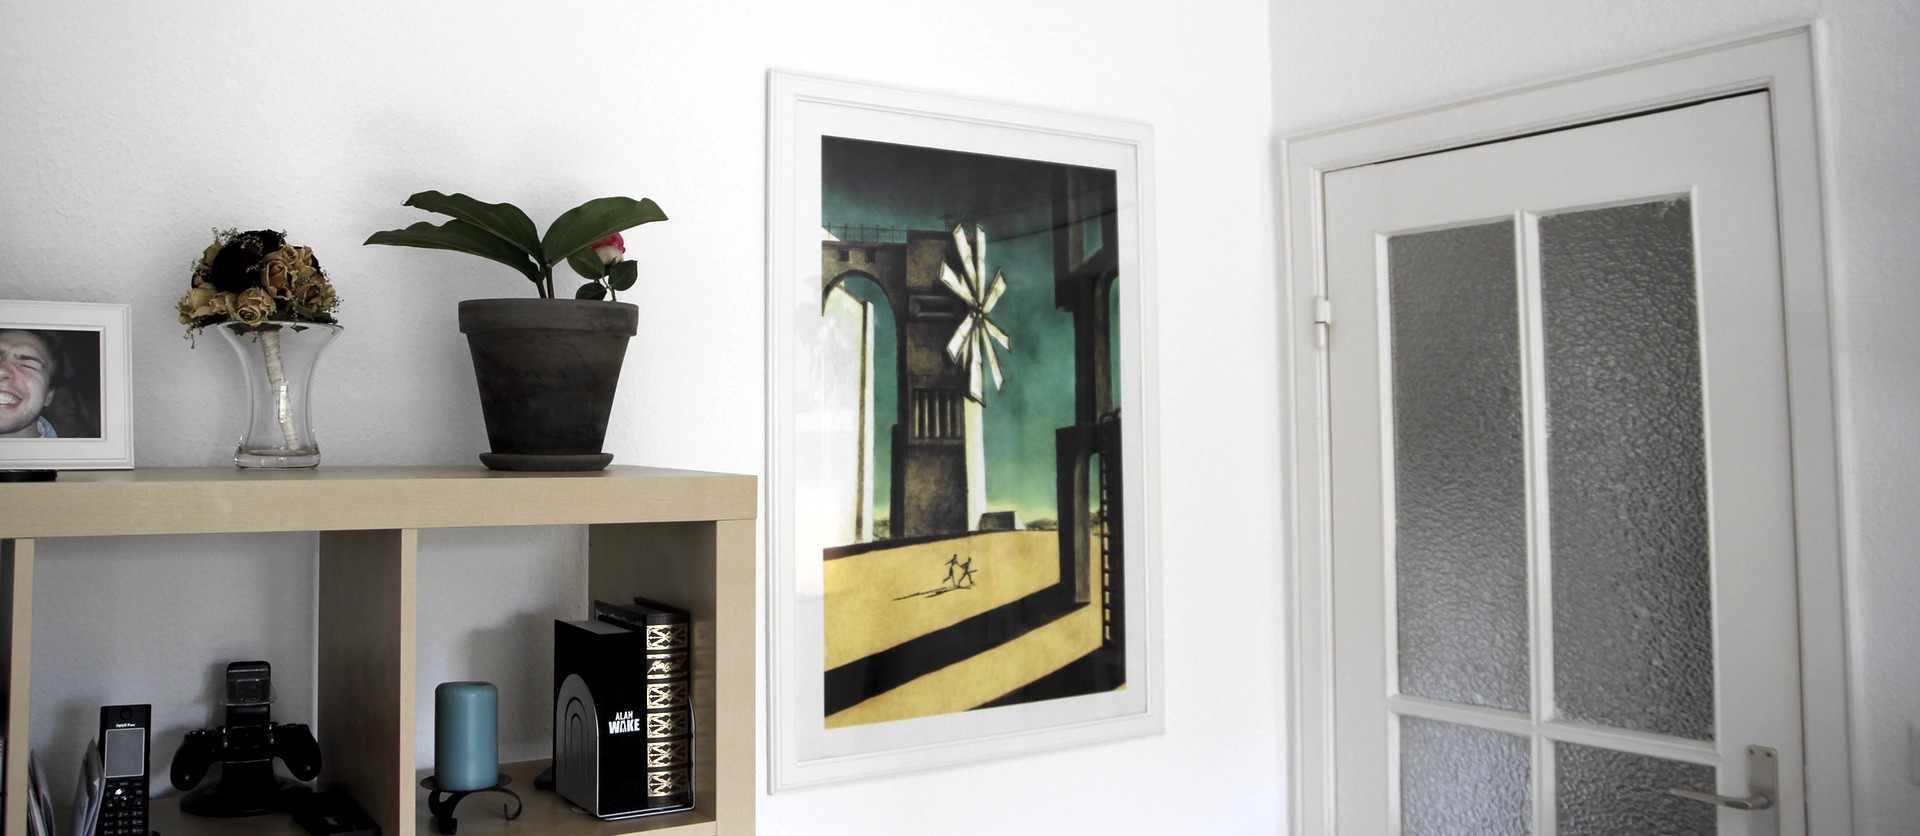 gaming bilder f r die wohnung marctv. Black Bedroom Furniture Sets. Home Design Ideas